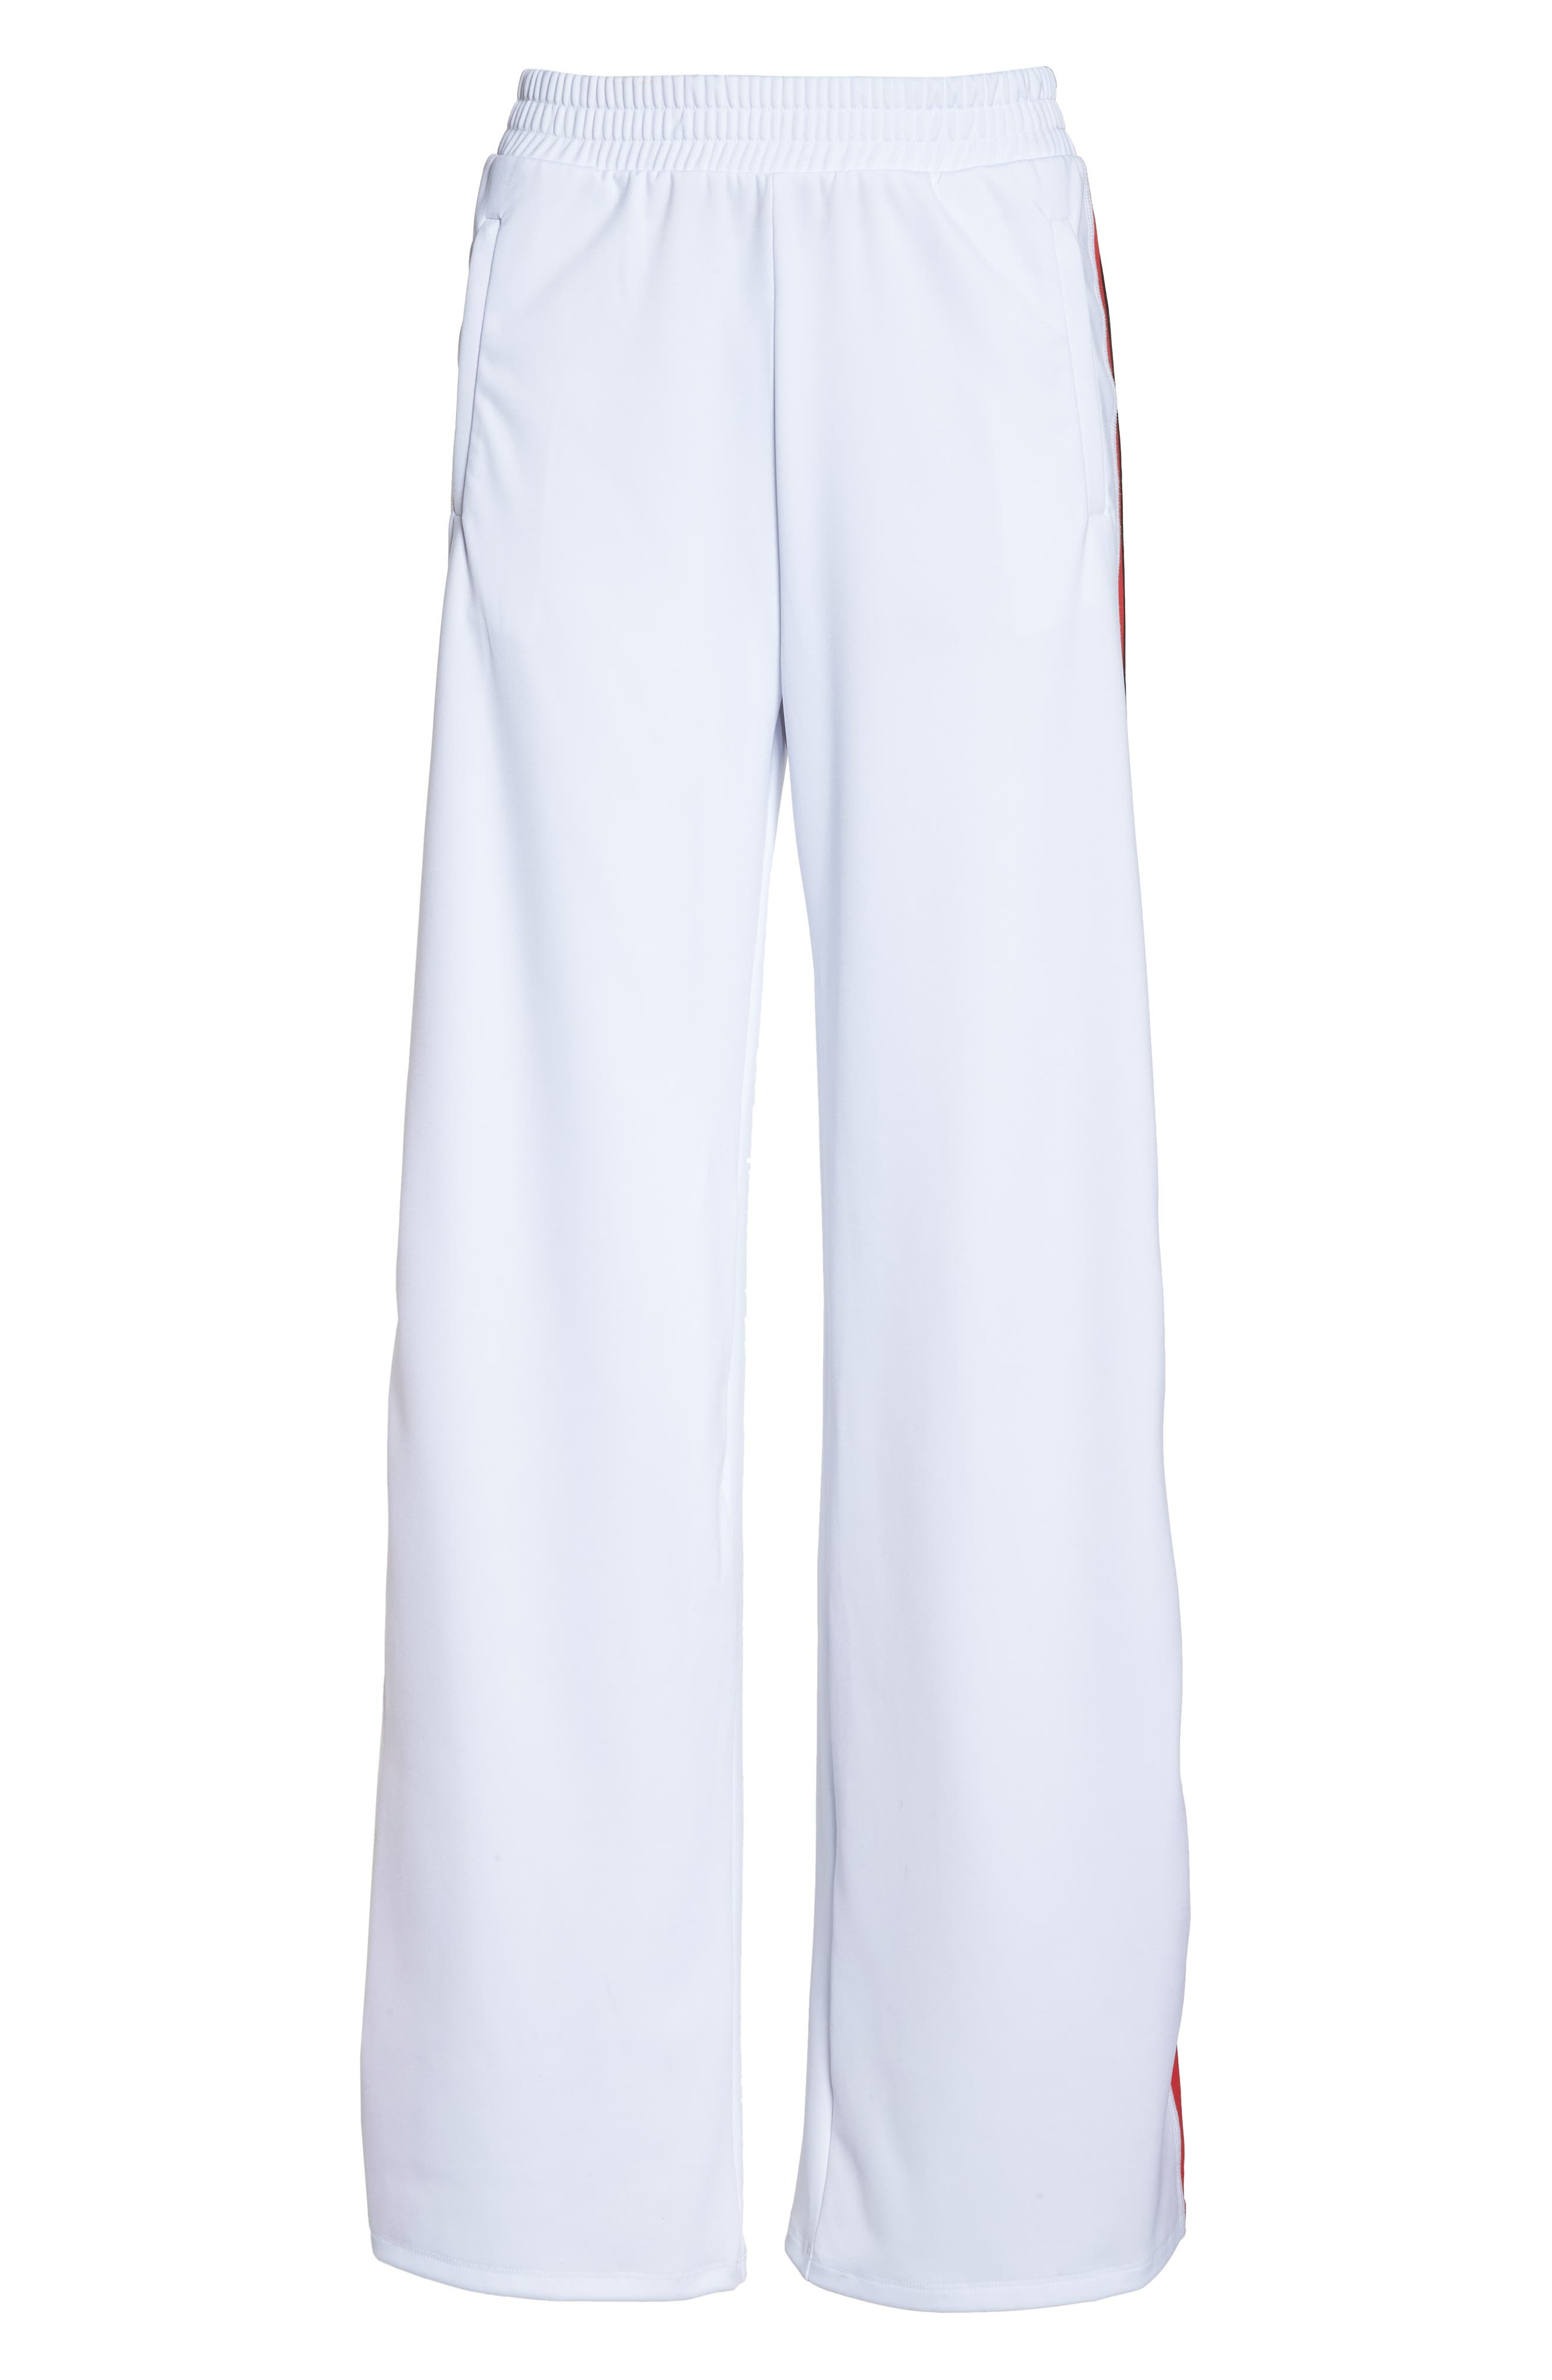 Wide Leg Track Pants,                             Alternate thumbnail 7, color,                             White/ Red/ Black